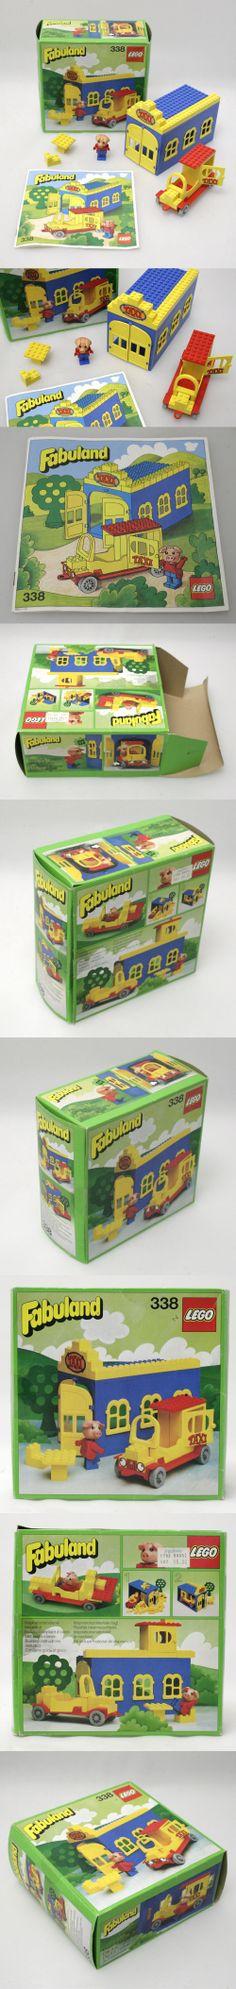 Vintage Lego Fabuland 338 NOW FOR SALE on EBAY.DE